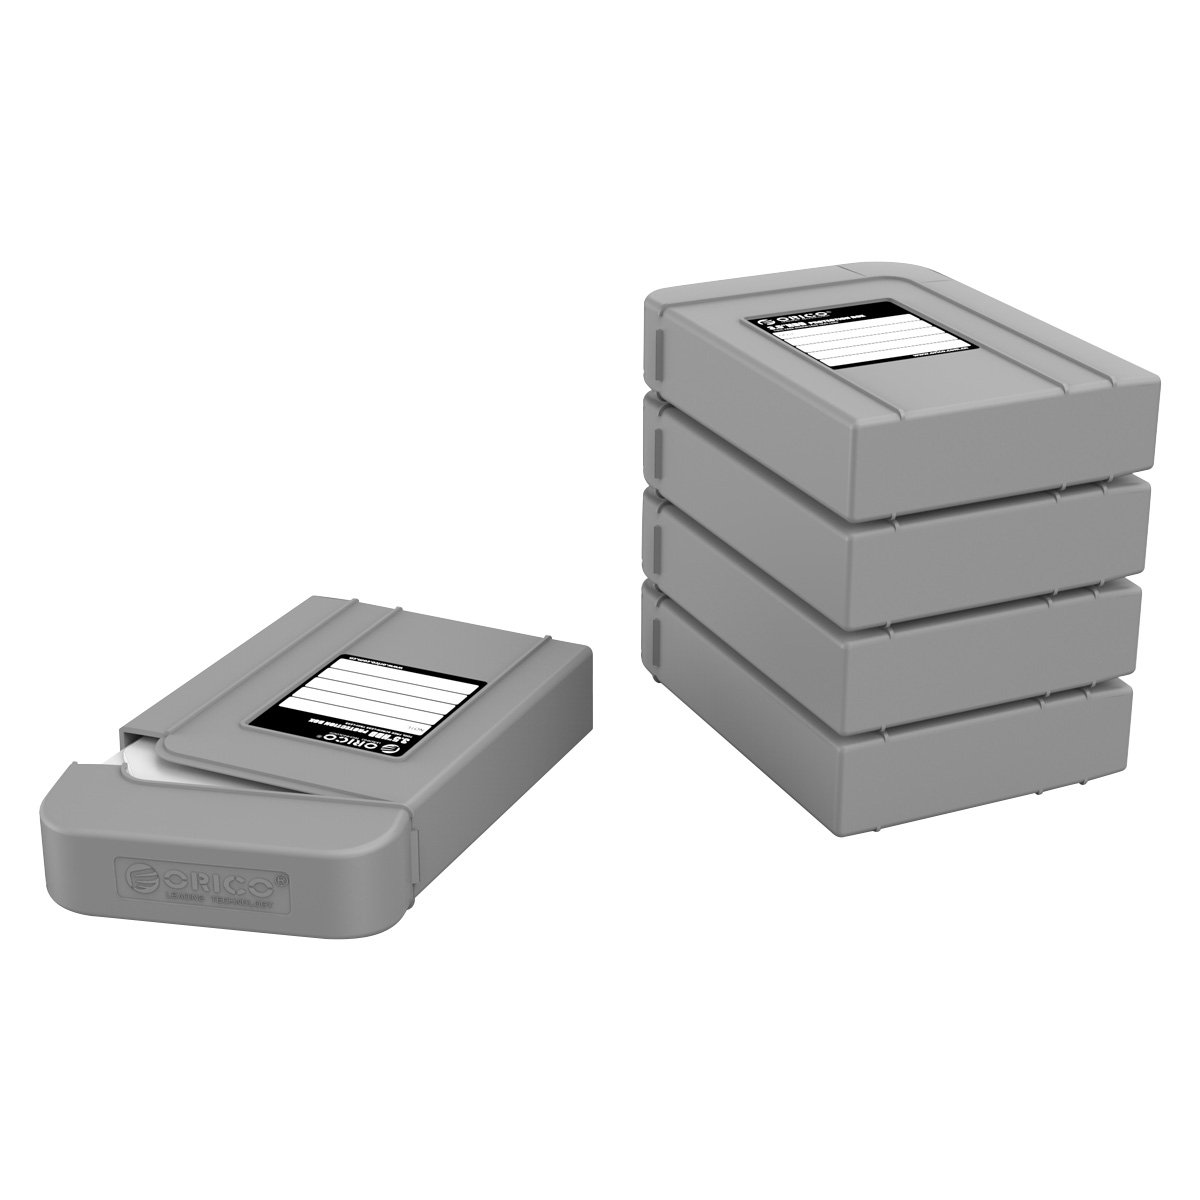 ORICO 3.5'' Hard Drive Case Protective Box Storage Case Organizational Box 5 Pack- Grey by ORICO